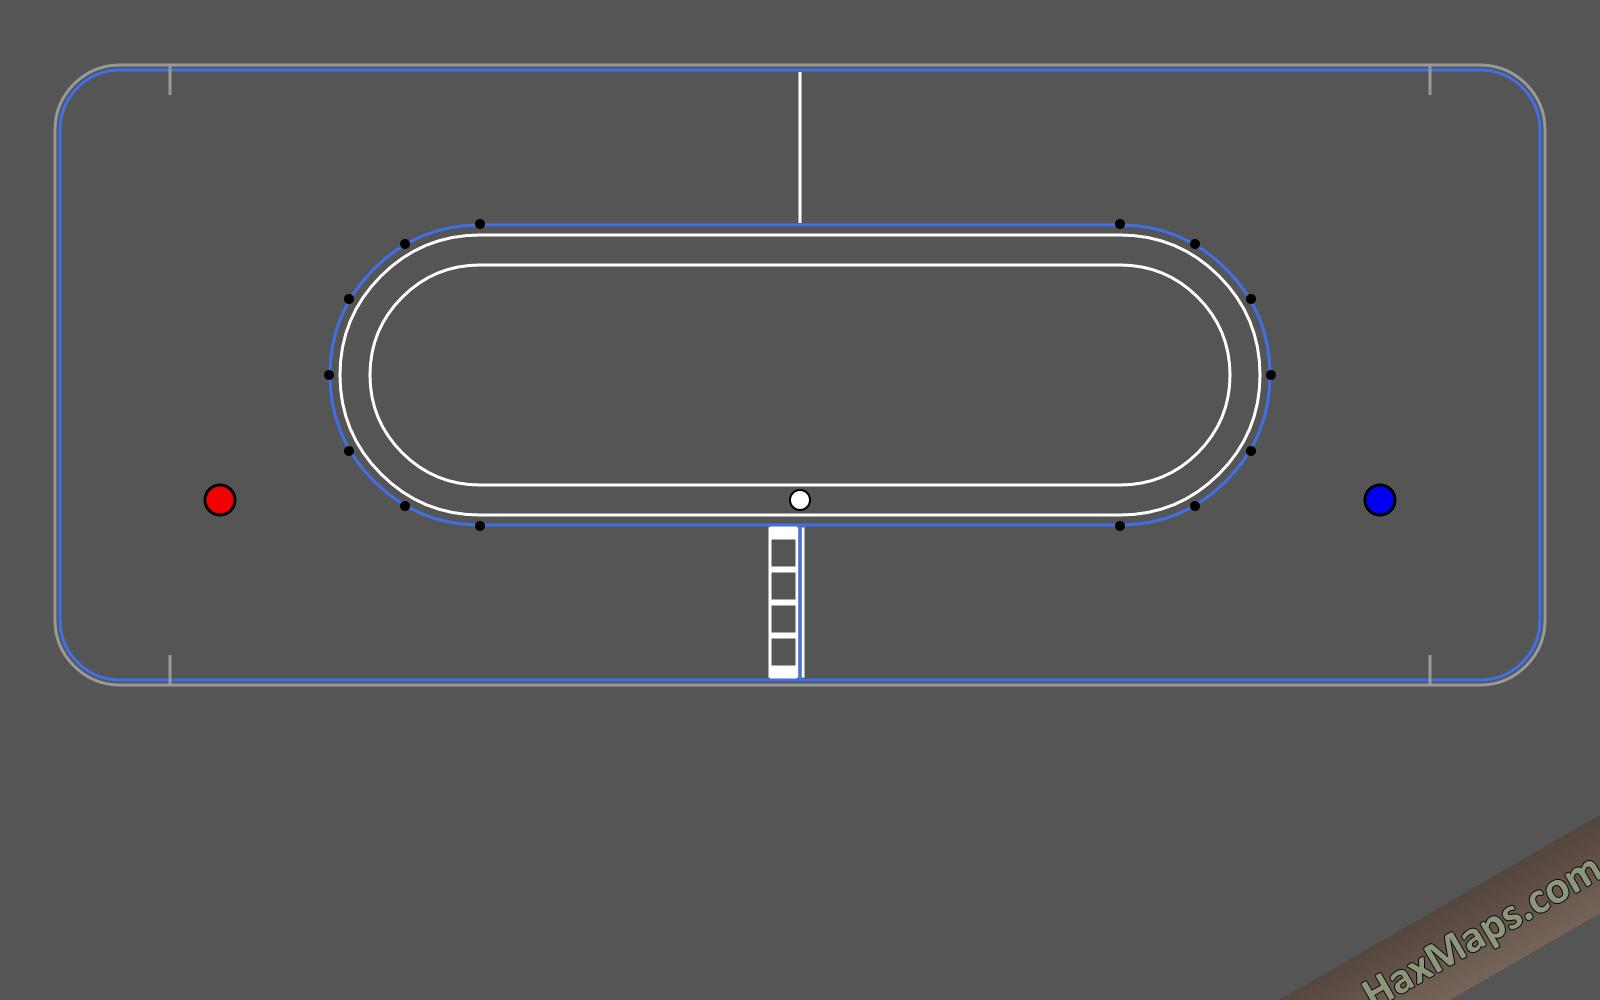 hax ball maps | Short Track v2